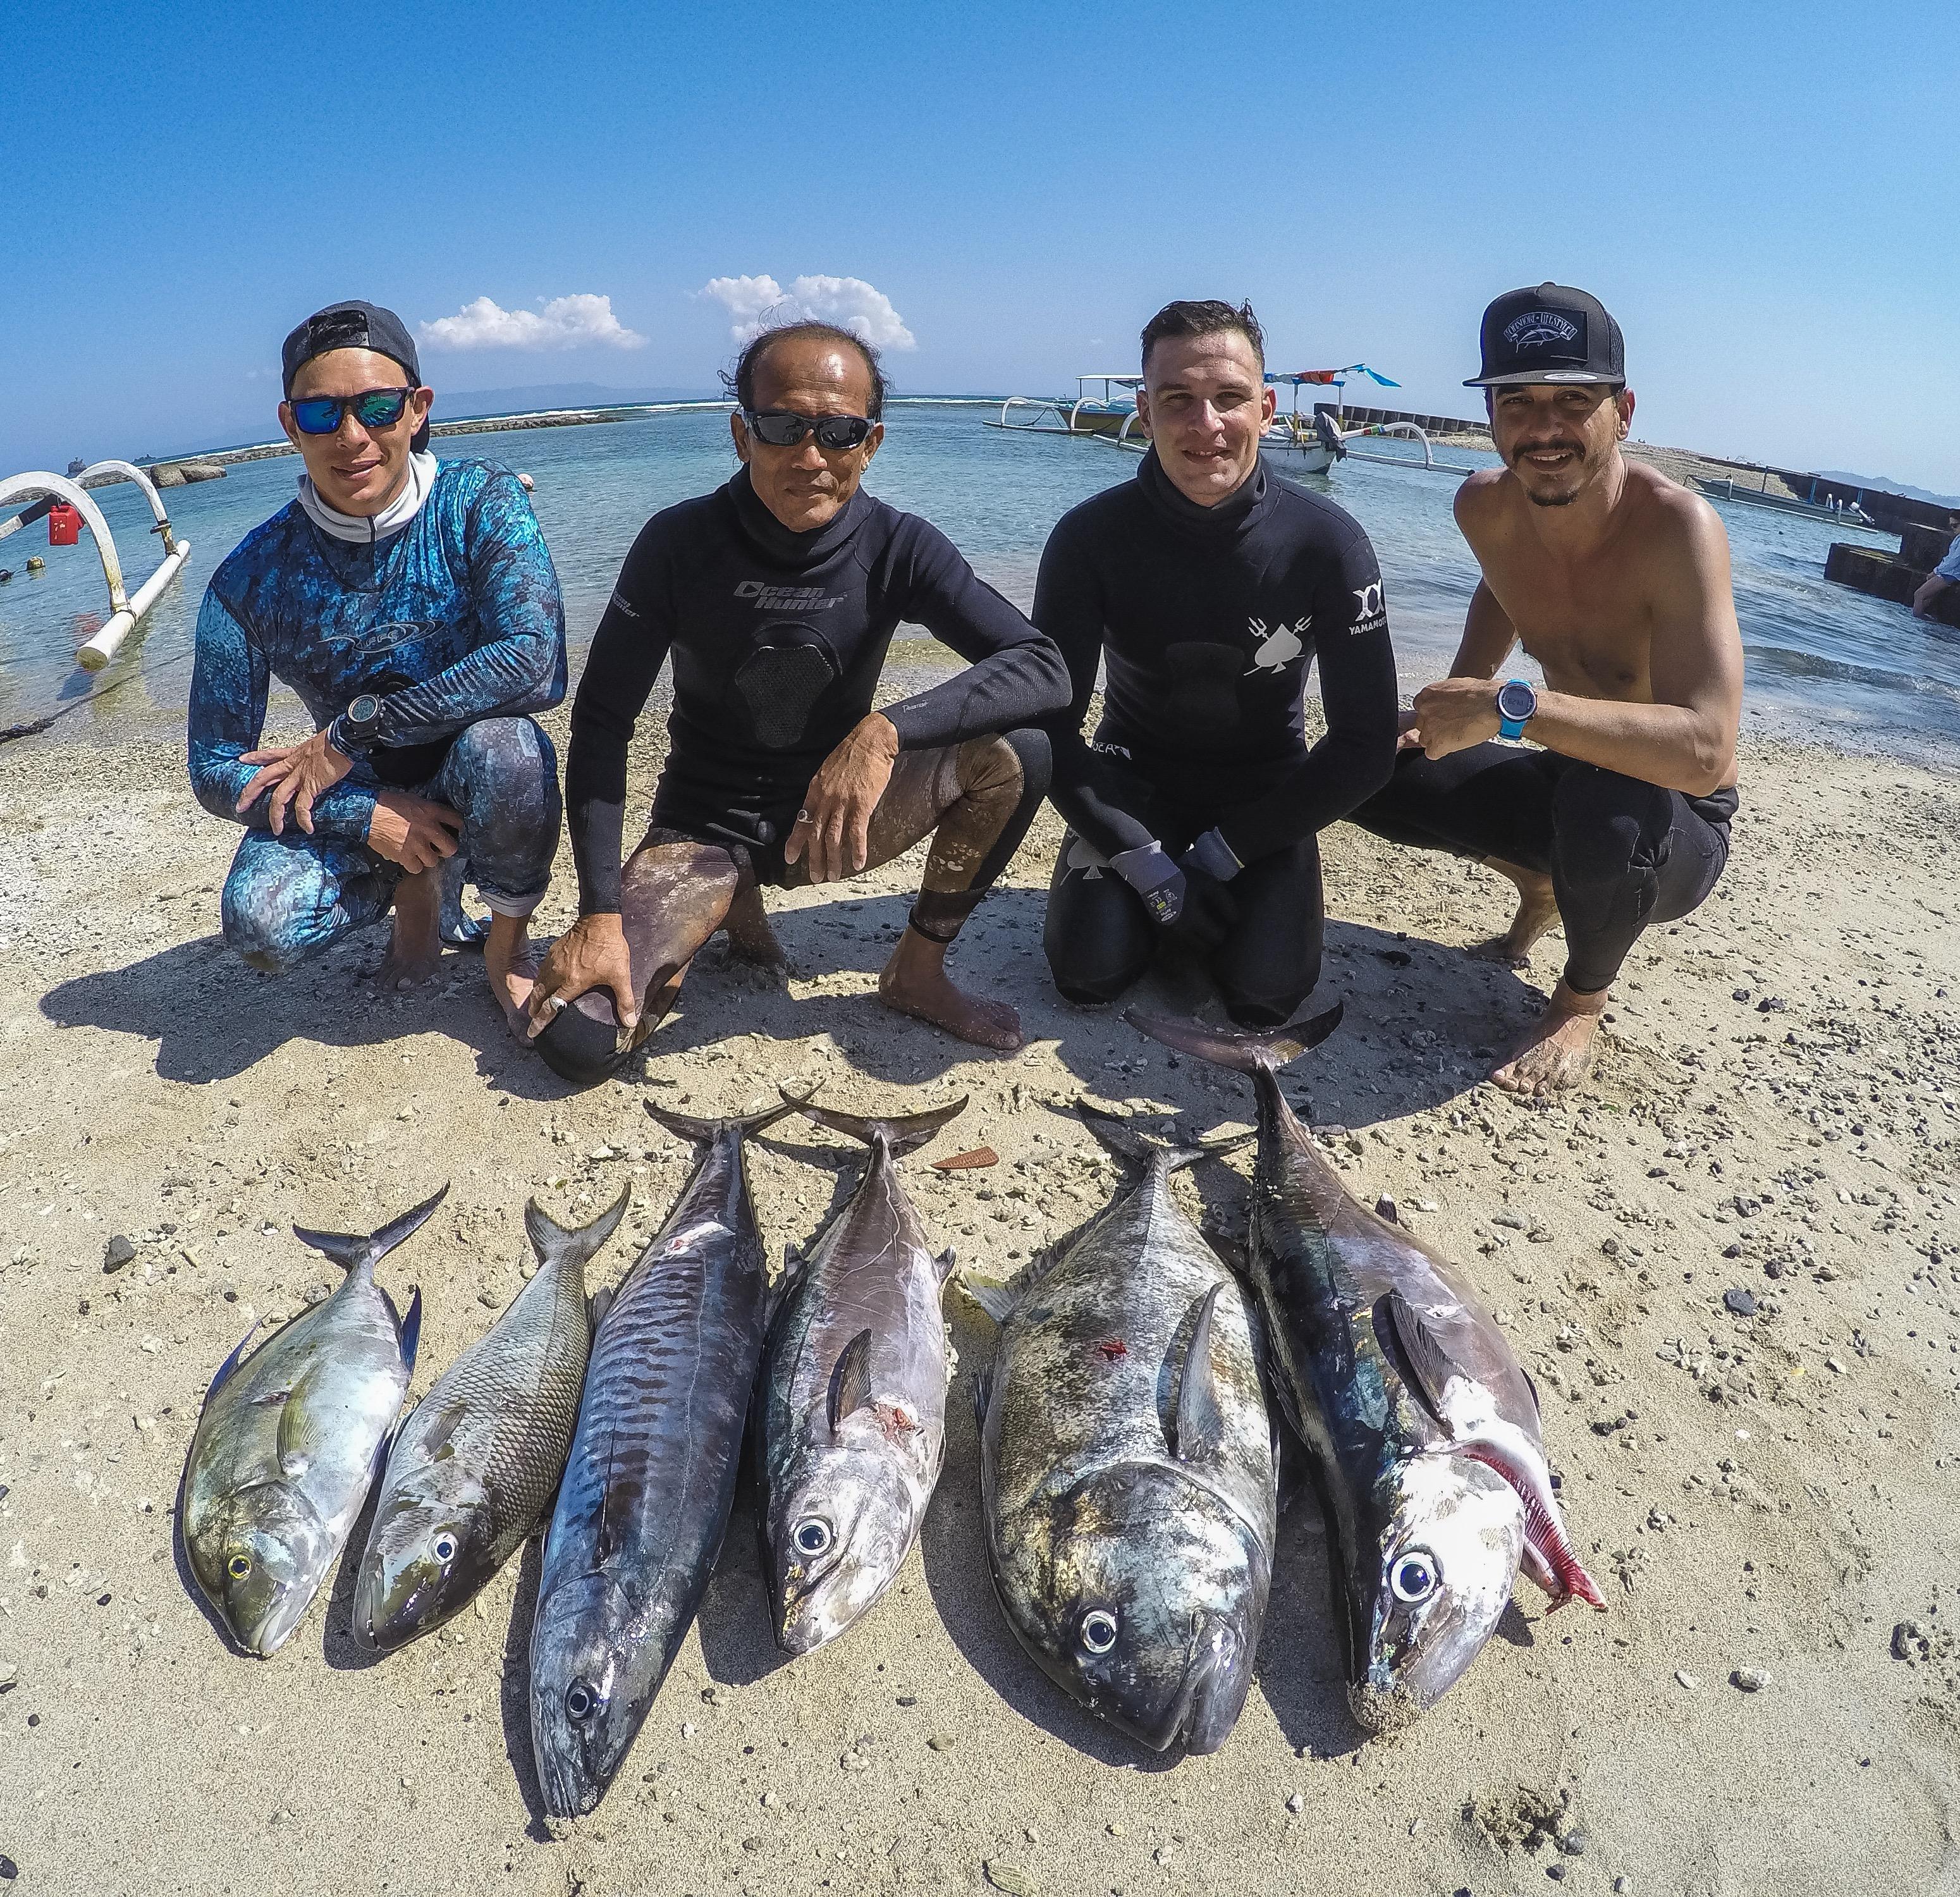 bali spearfishing, Green job fish, dogtooth tuna, giant trevally, Spanish mackerel